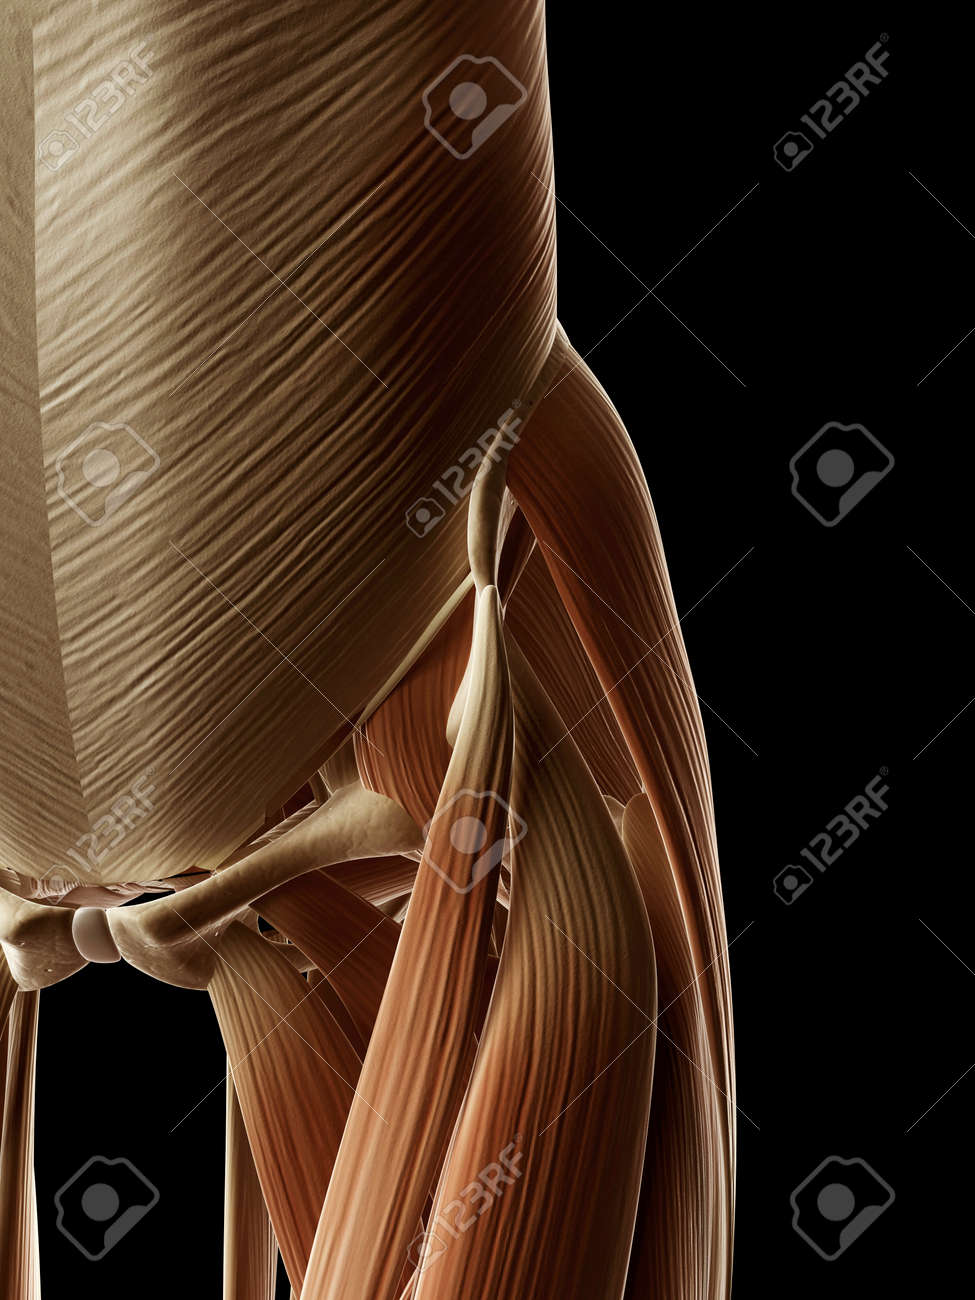 medical illustration of the hip/leg bones Stock Photo - 22818698